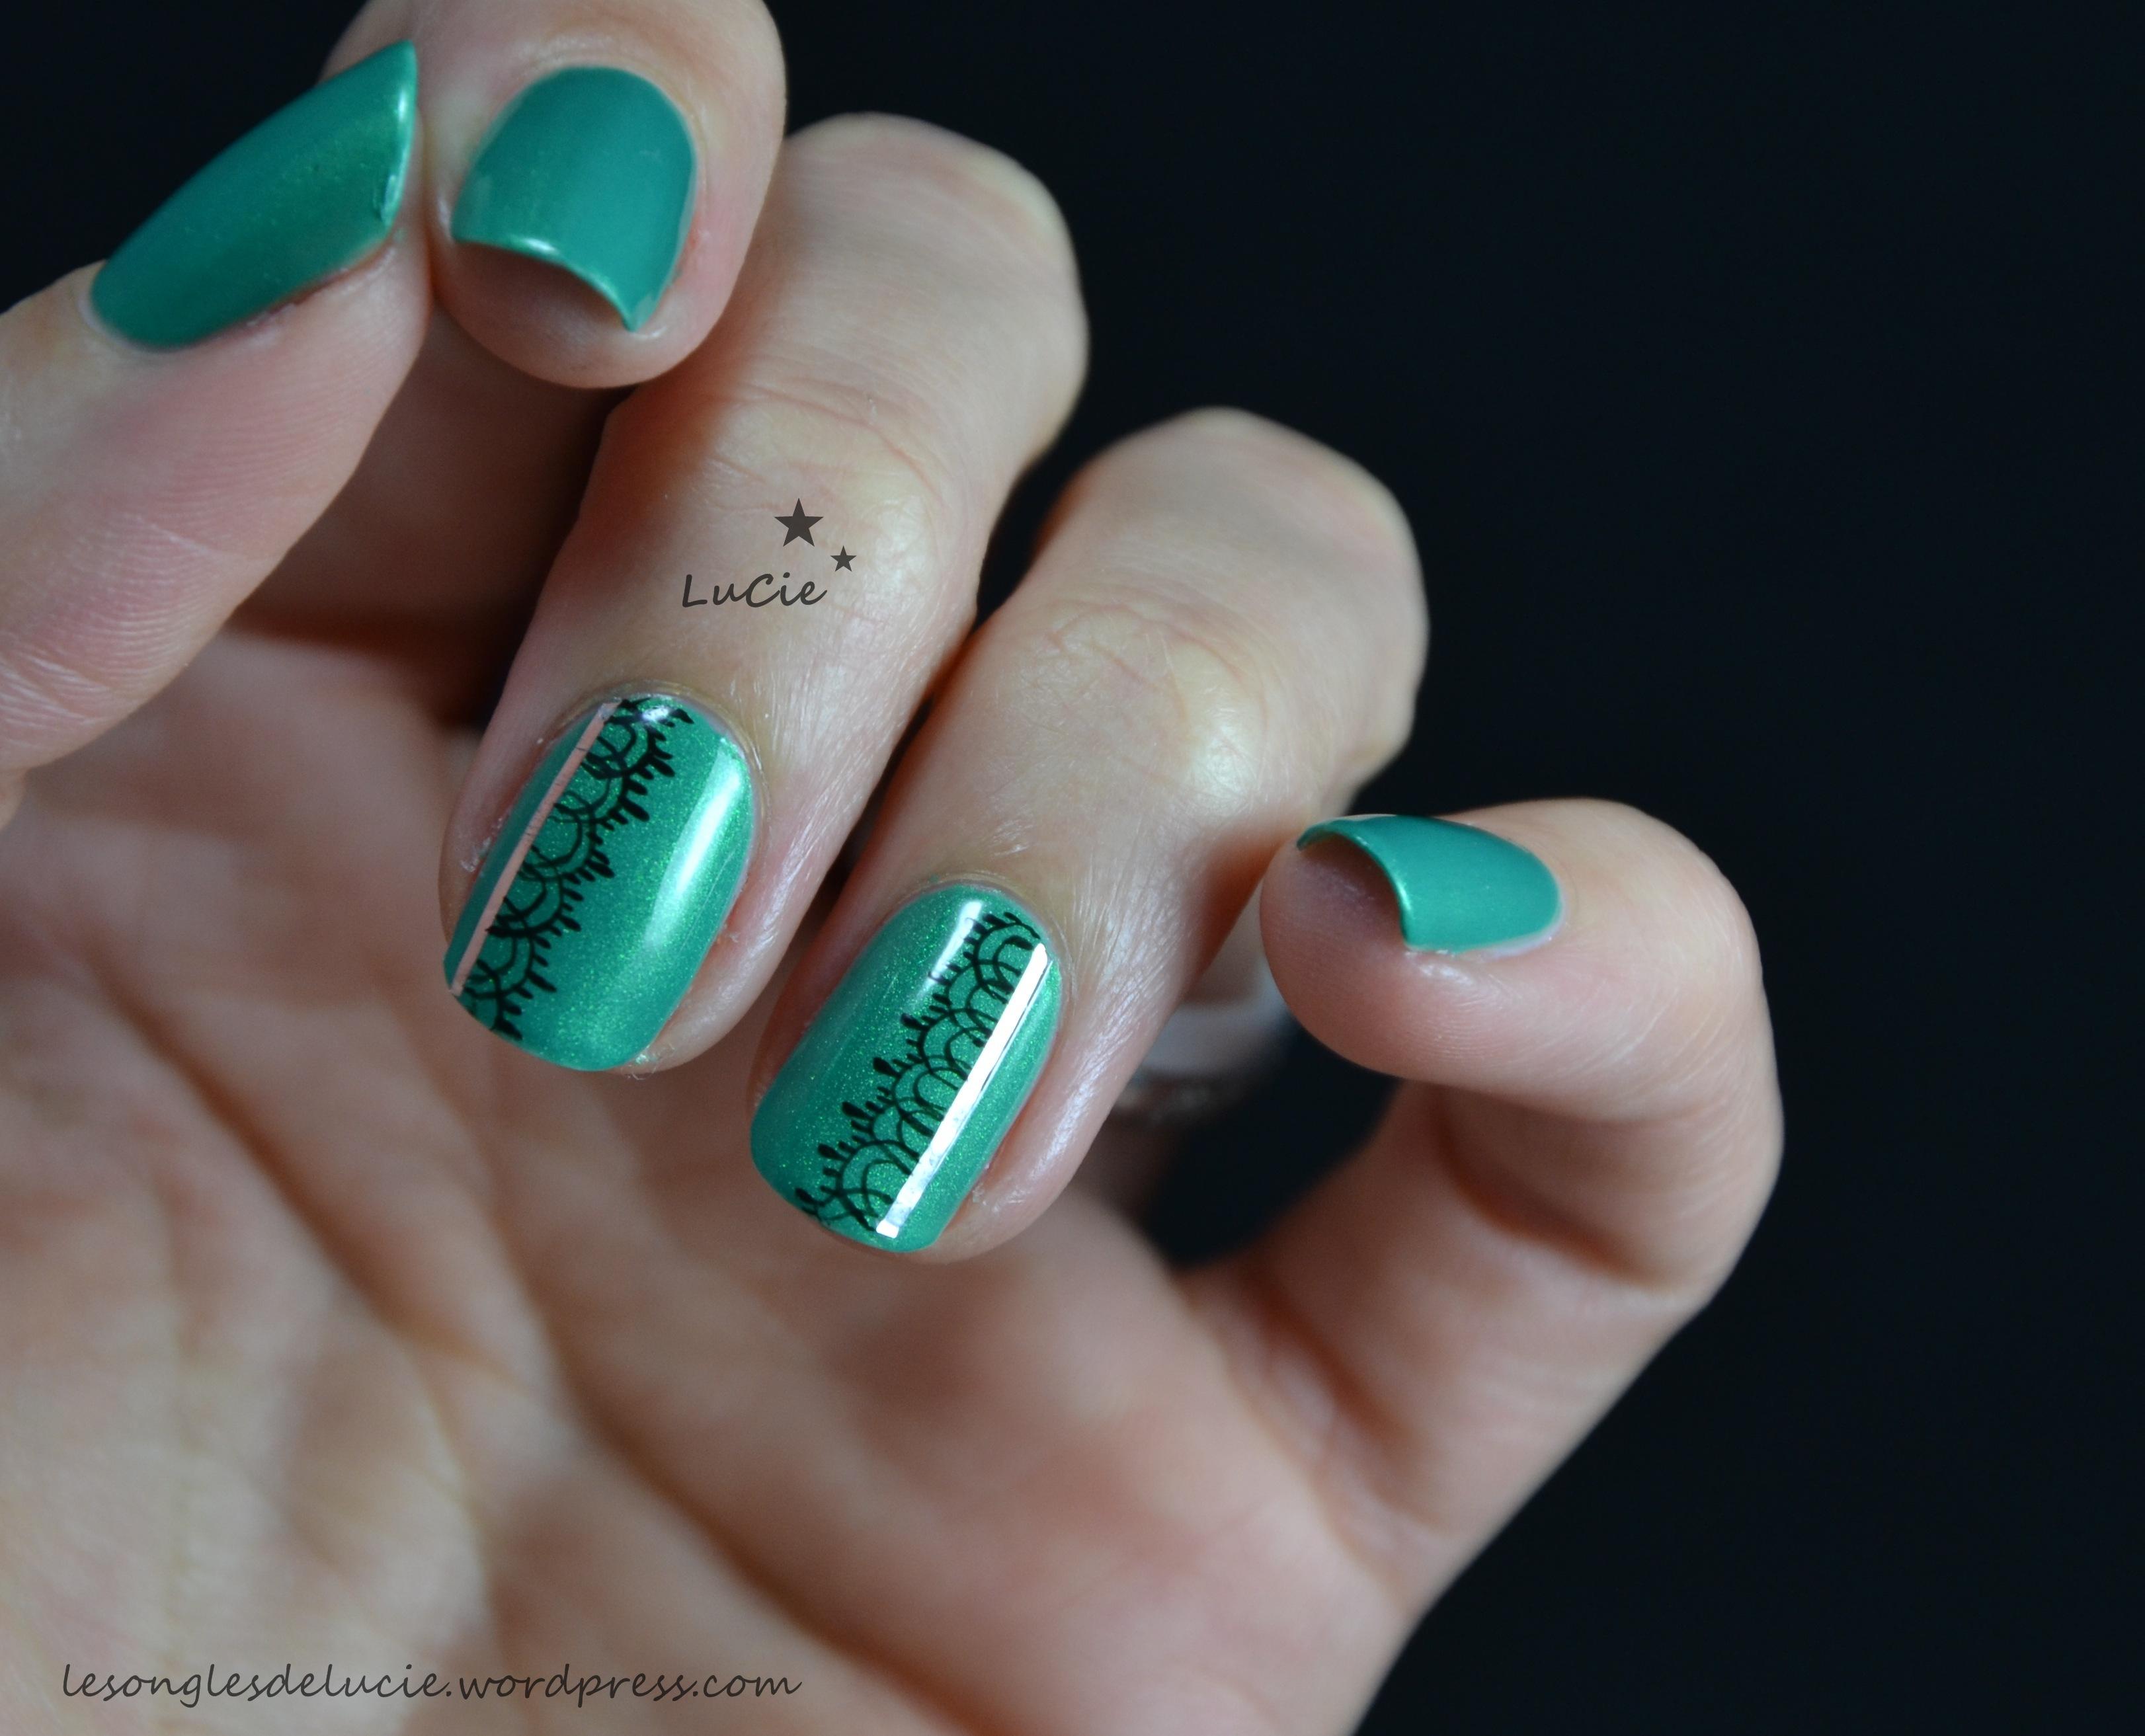 Nail art facile et discret - Nail art discret ...